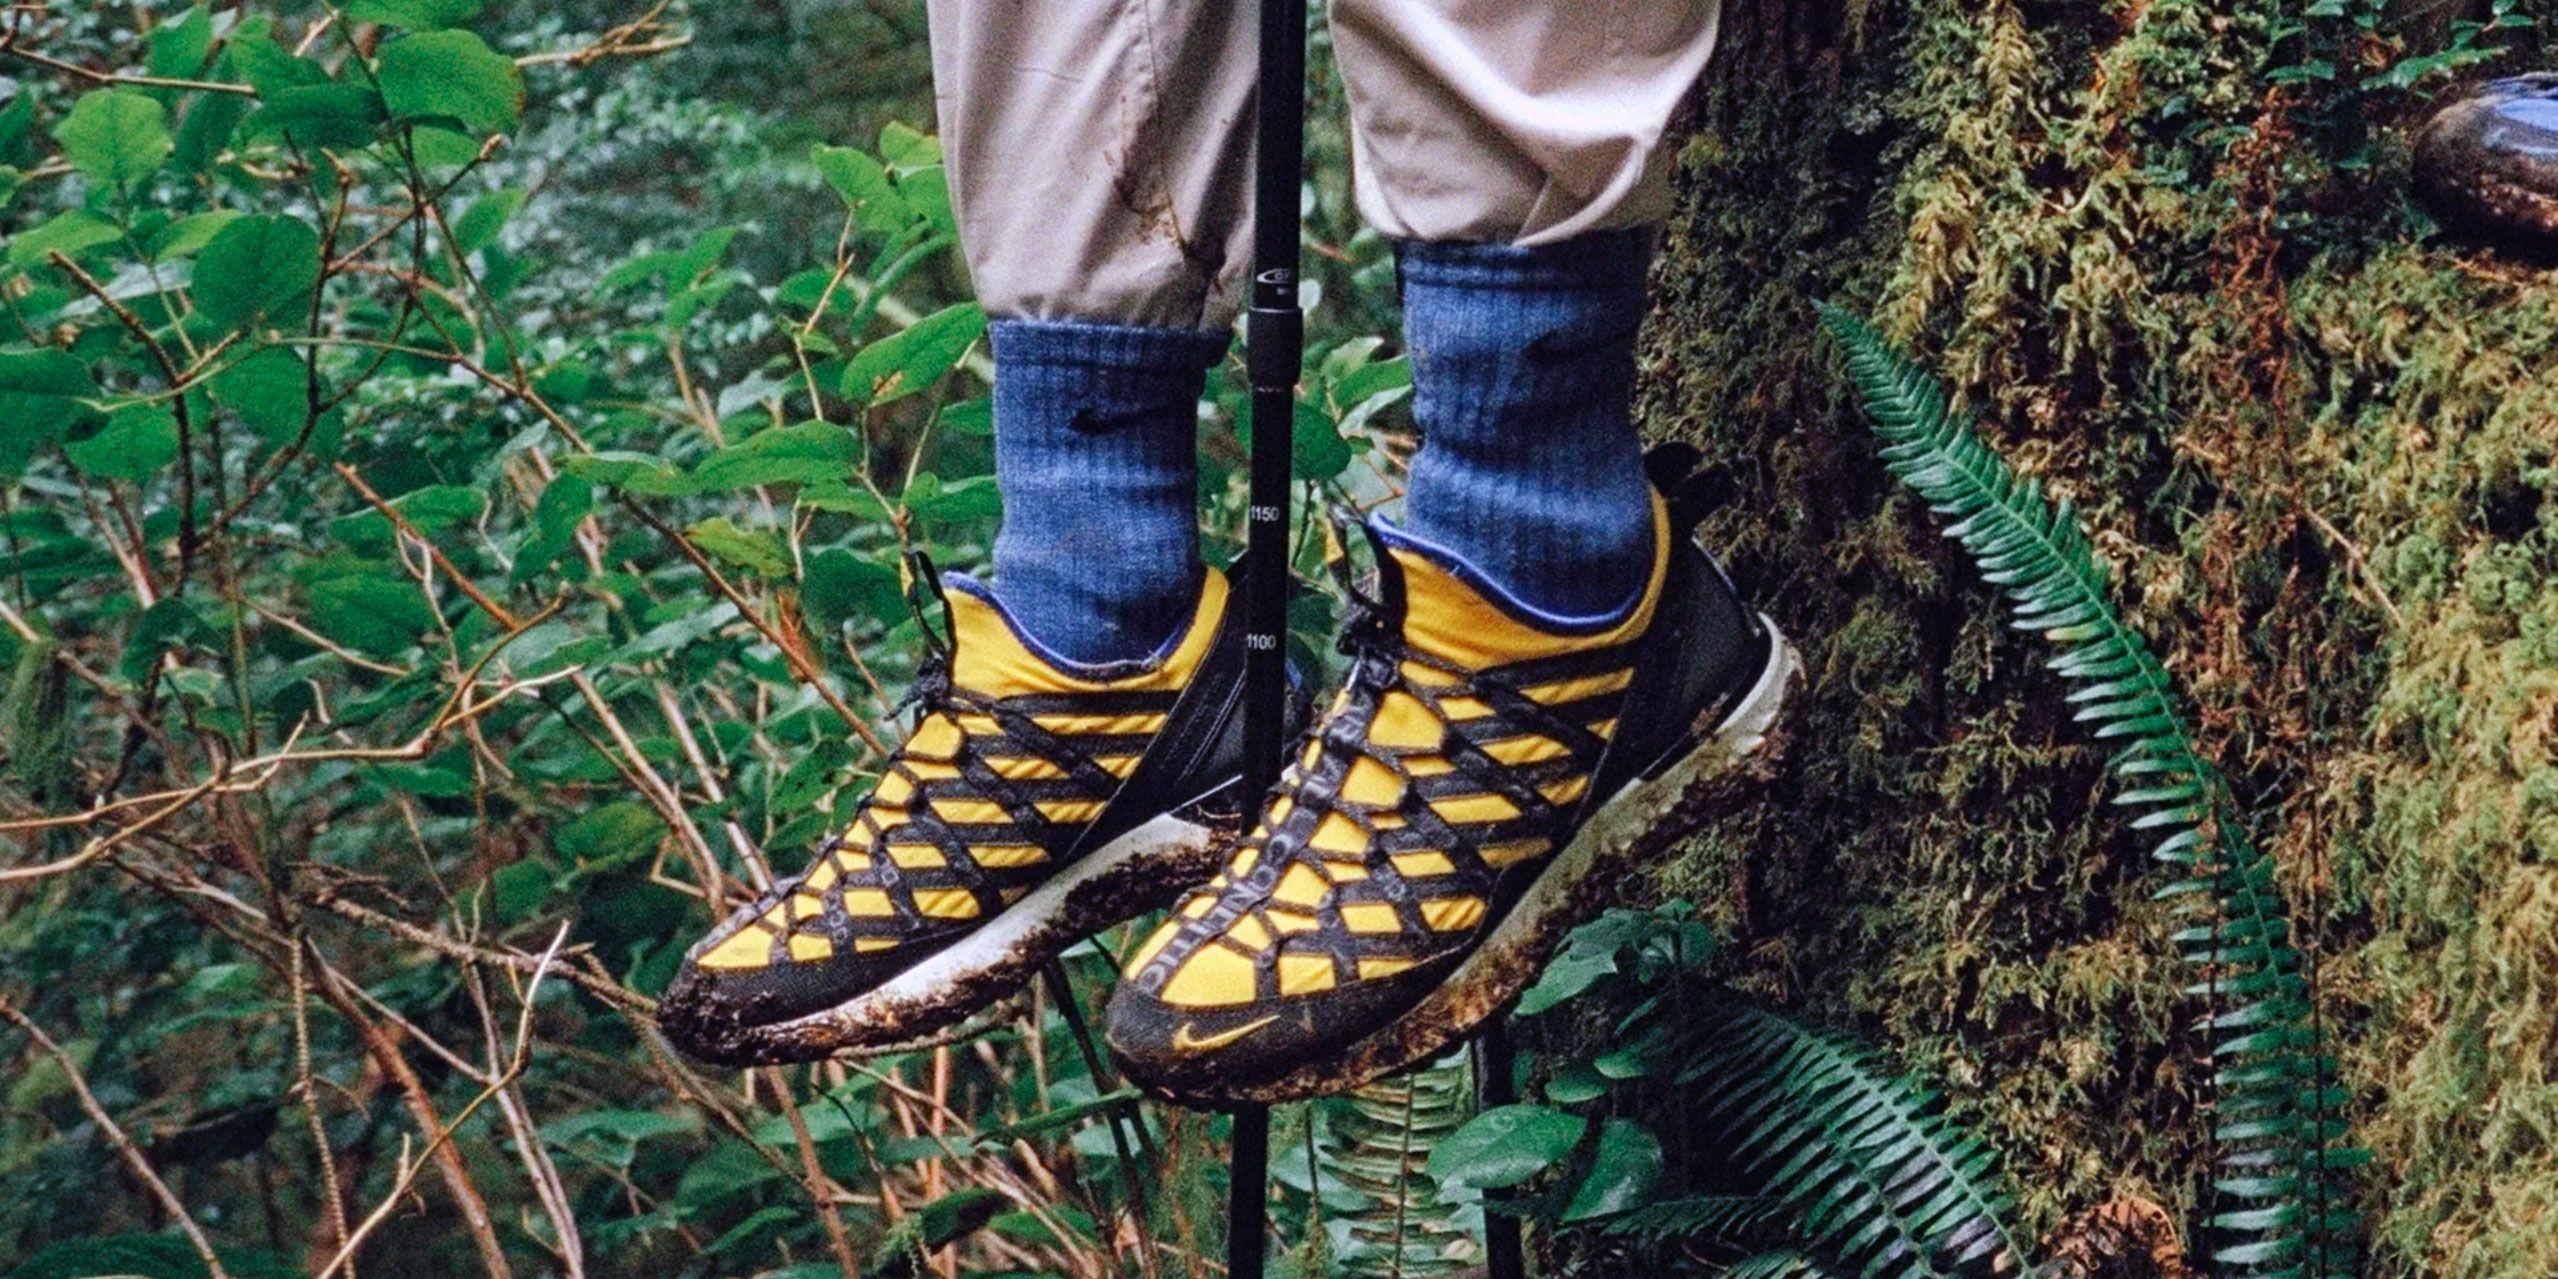 Nike Hiking Shoes Waterproof Salbolier Best Trail For Men